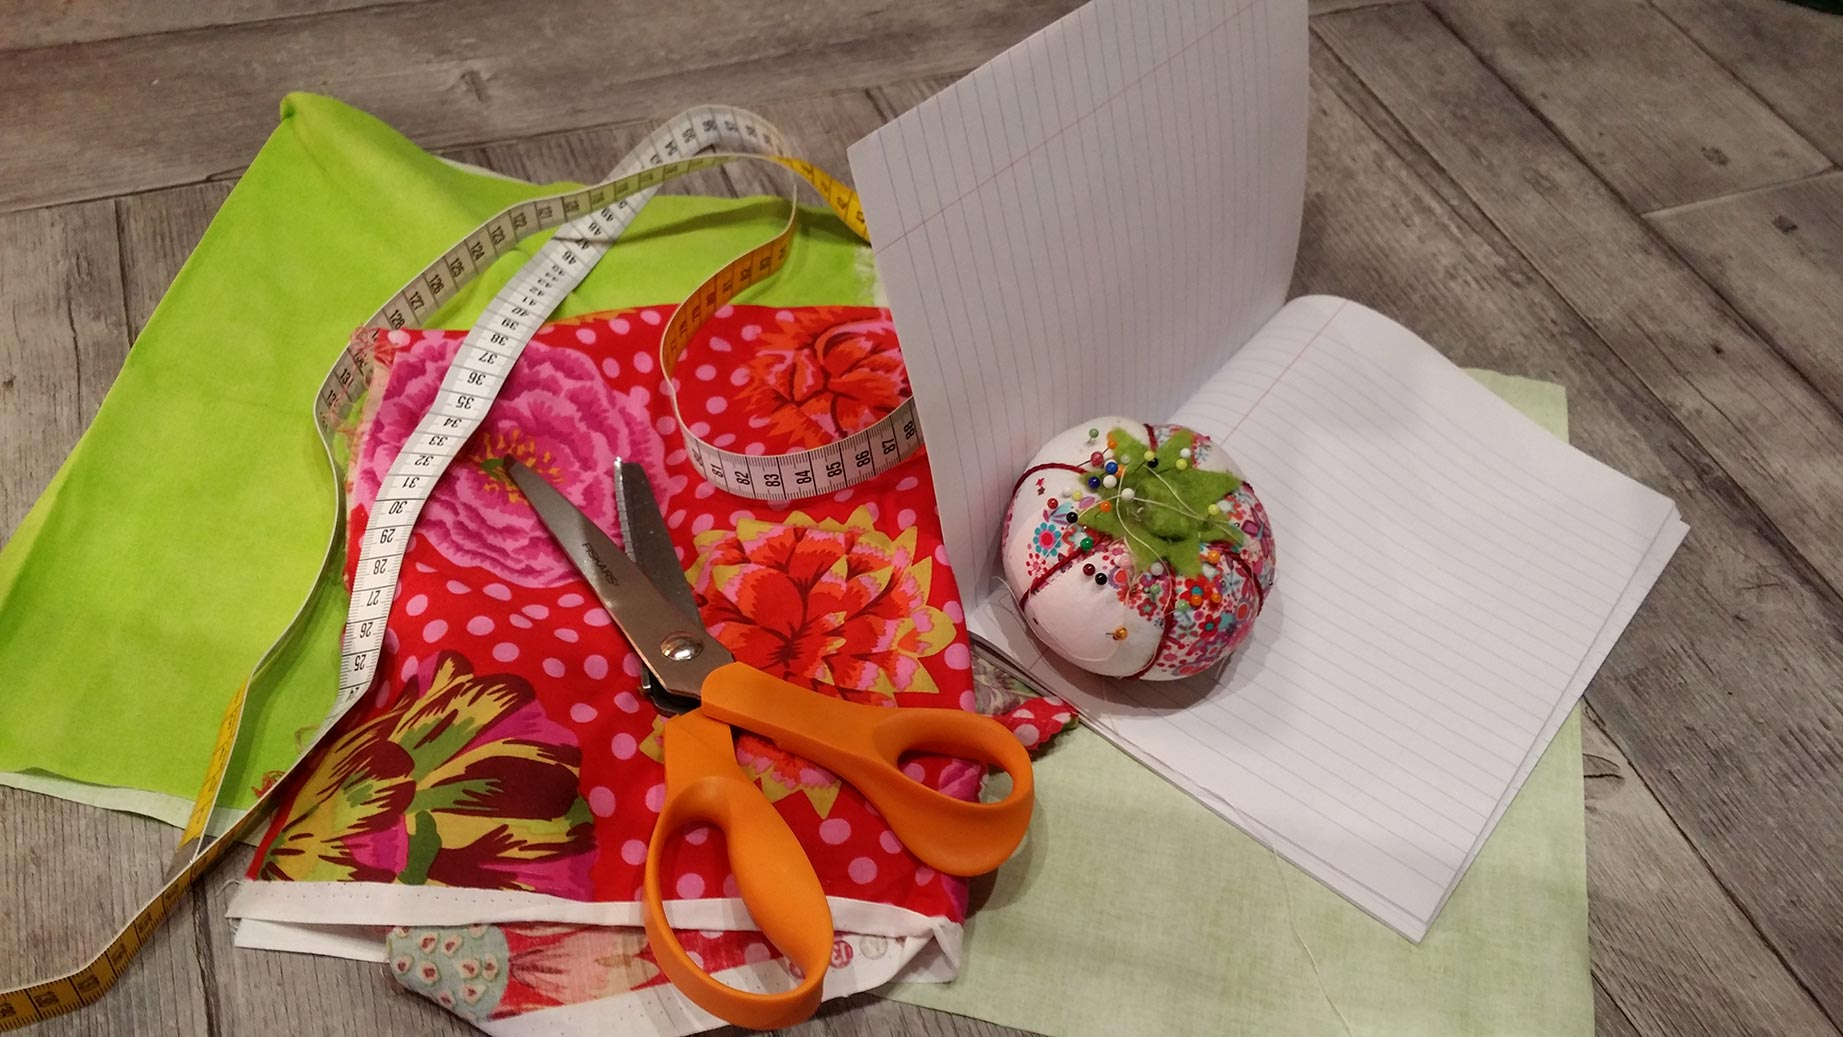 rentree-protege-cahier-zero-dechet-tissu-recyclage-facile-couture